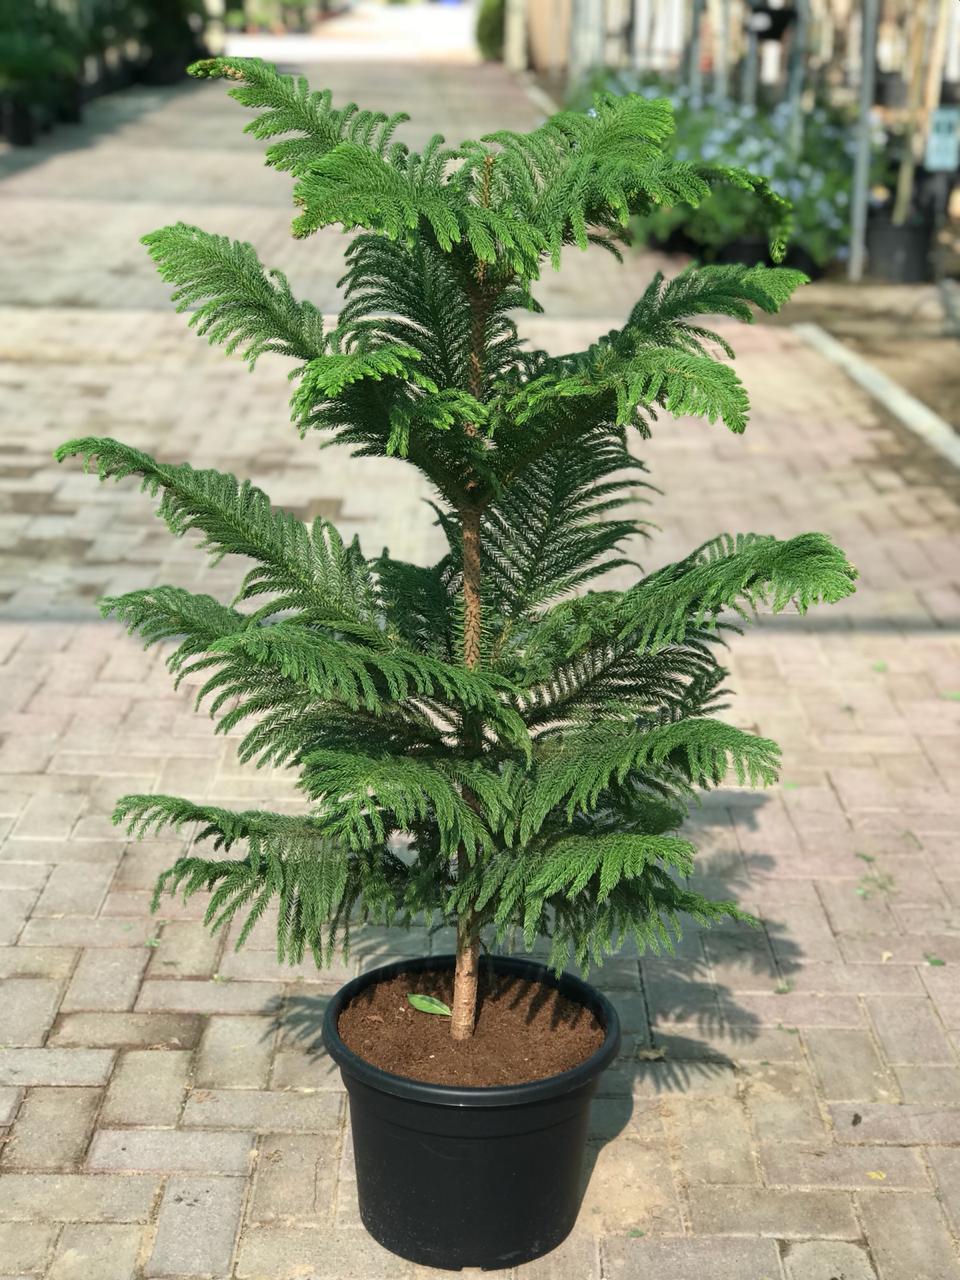 Araucaria Heterophylla Norfolk Island Pine Tree Buy Online Green Souq Uae Norfolk Pine Conifer Trees Plants